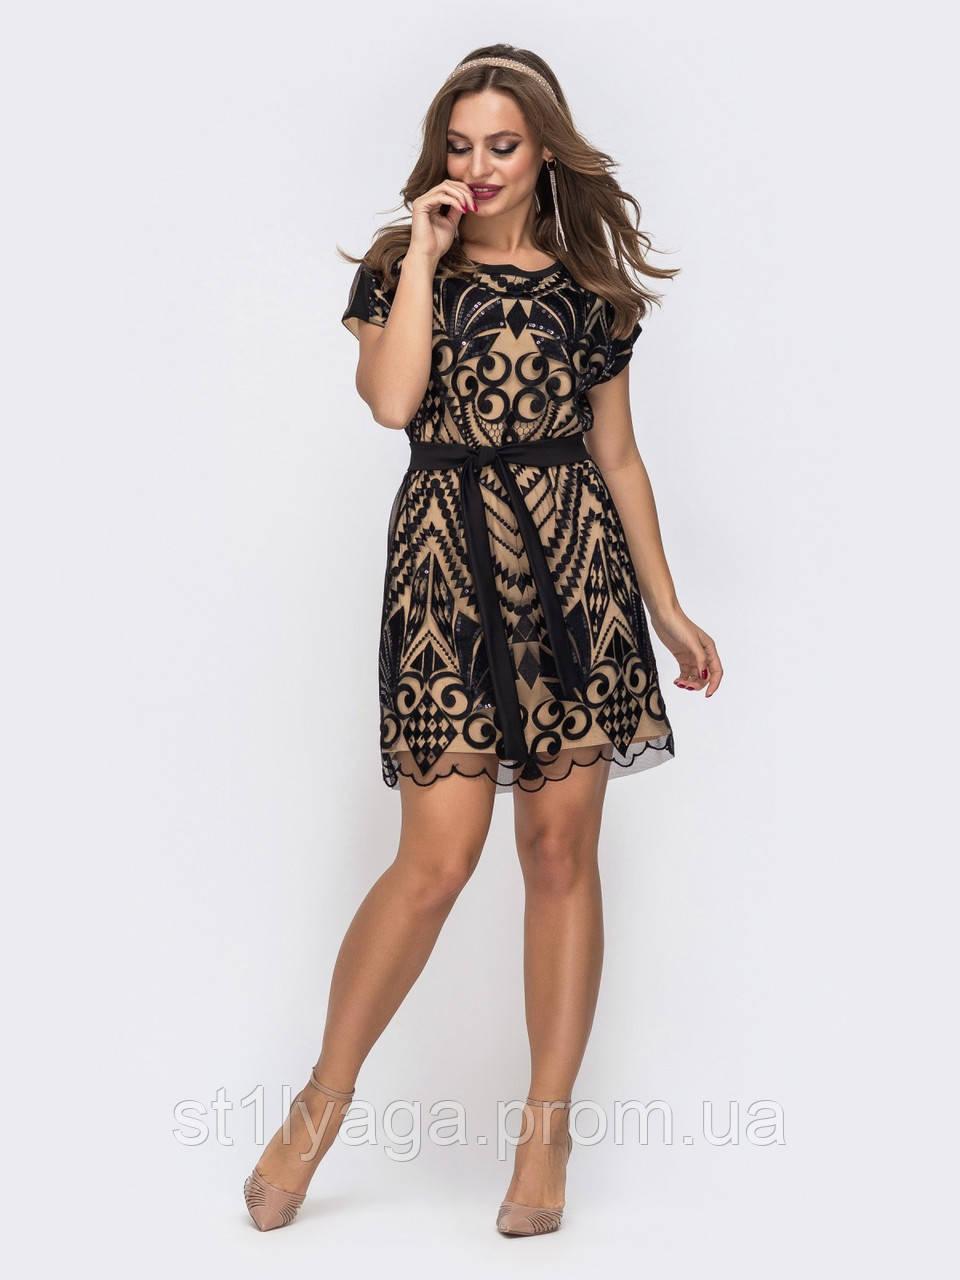 Вечернее  платье мини из трикотажа с узором из пайеток